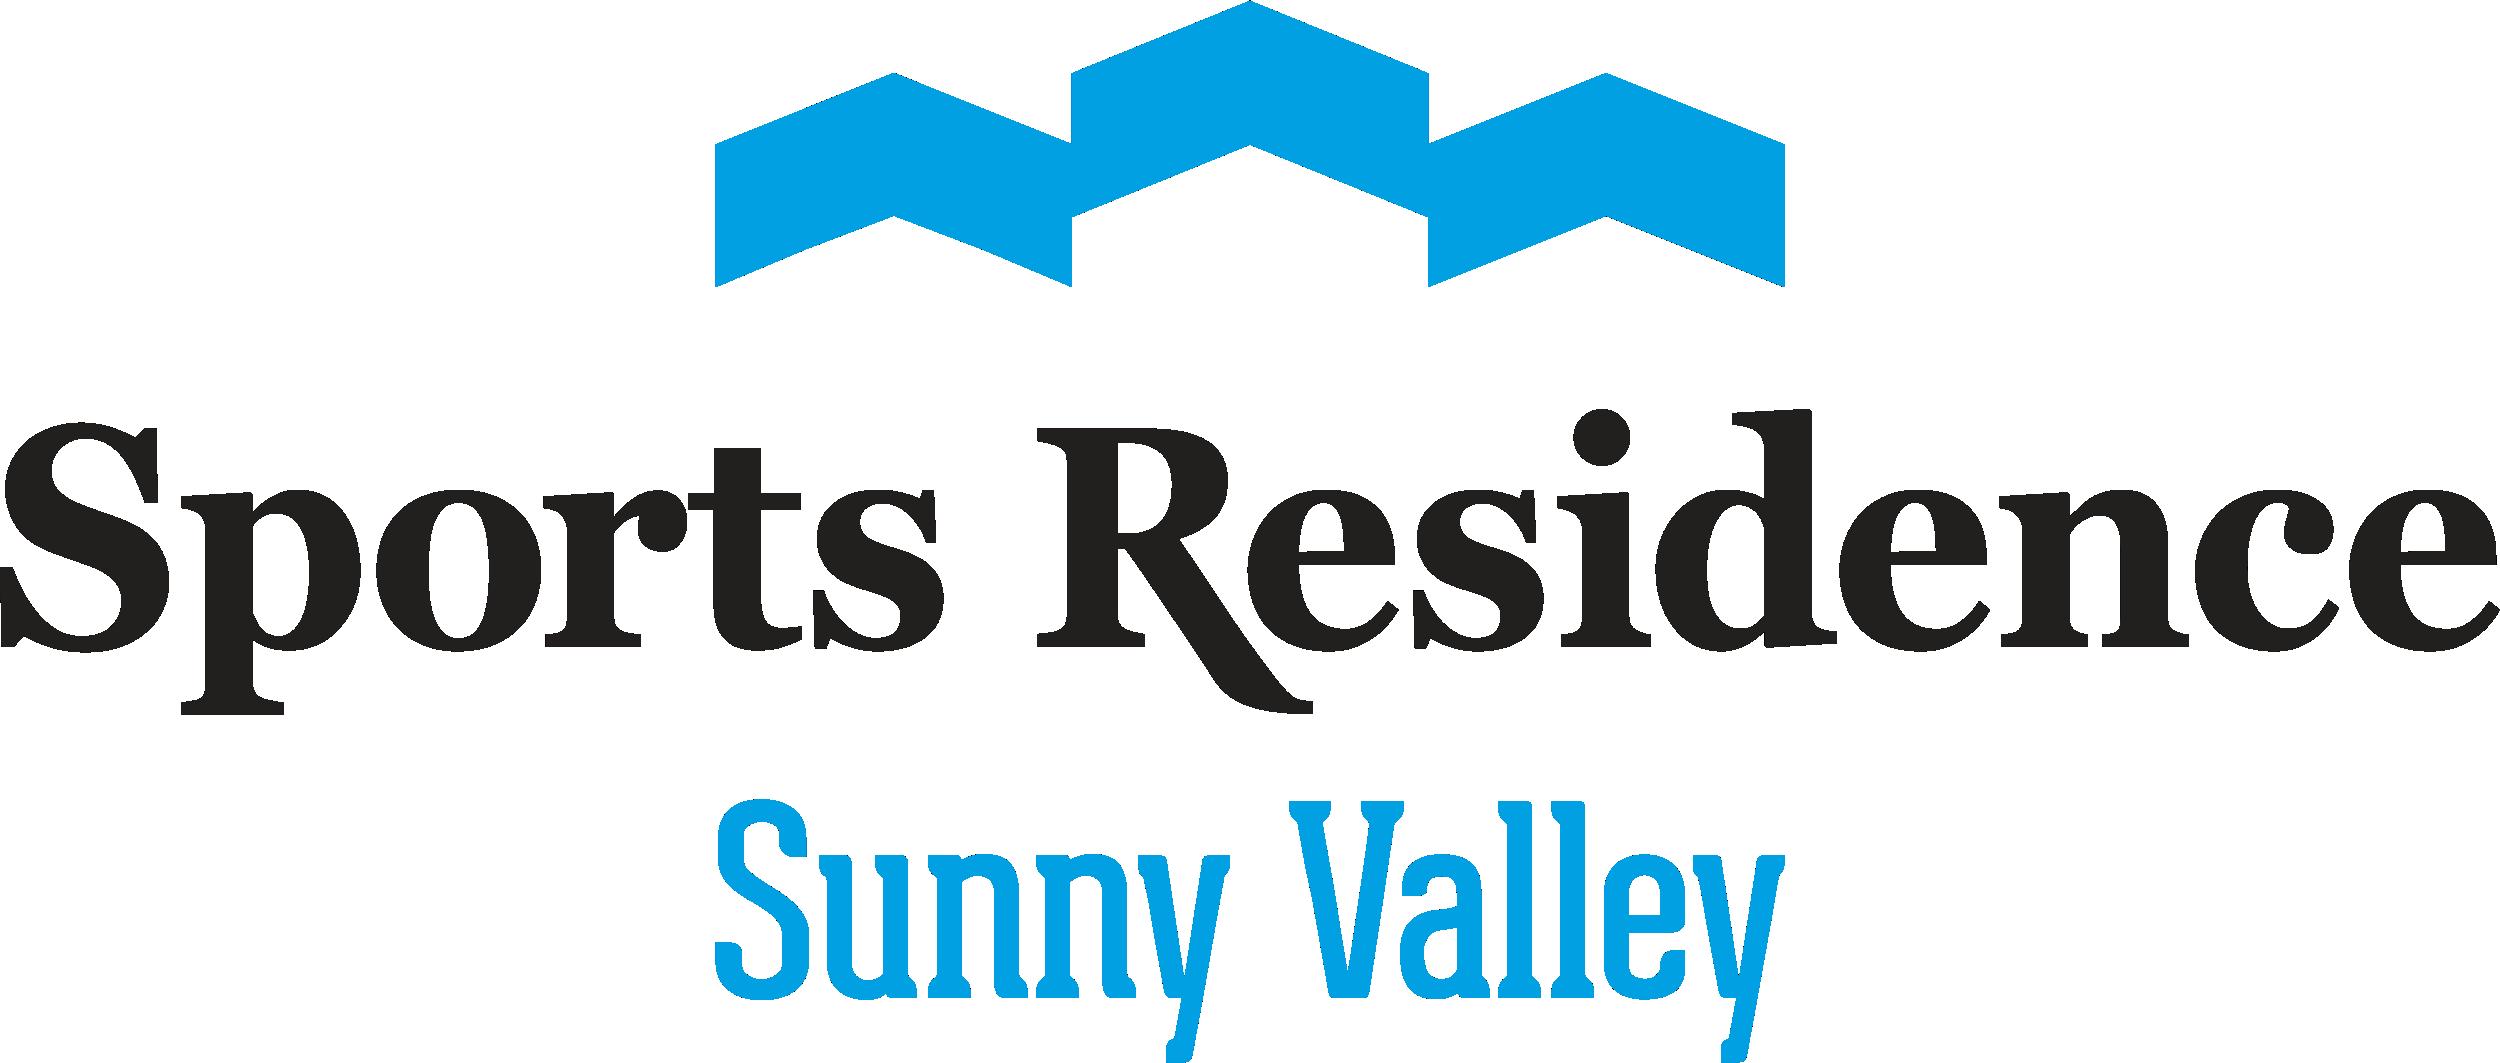 Логотип партнёра: Sunny Valley Sports Residence